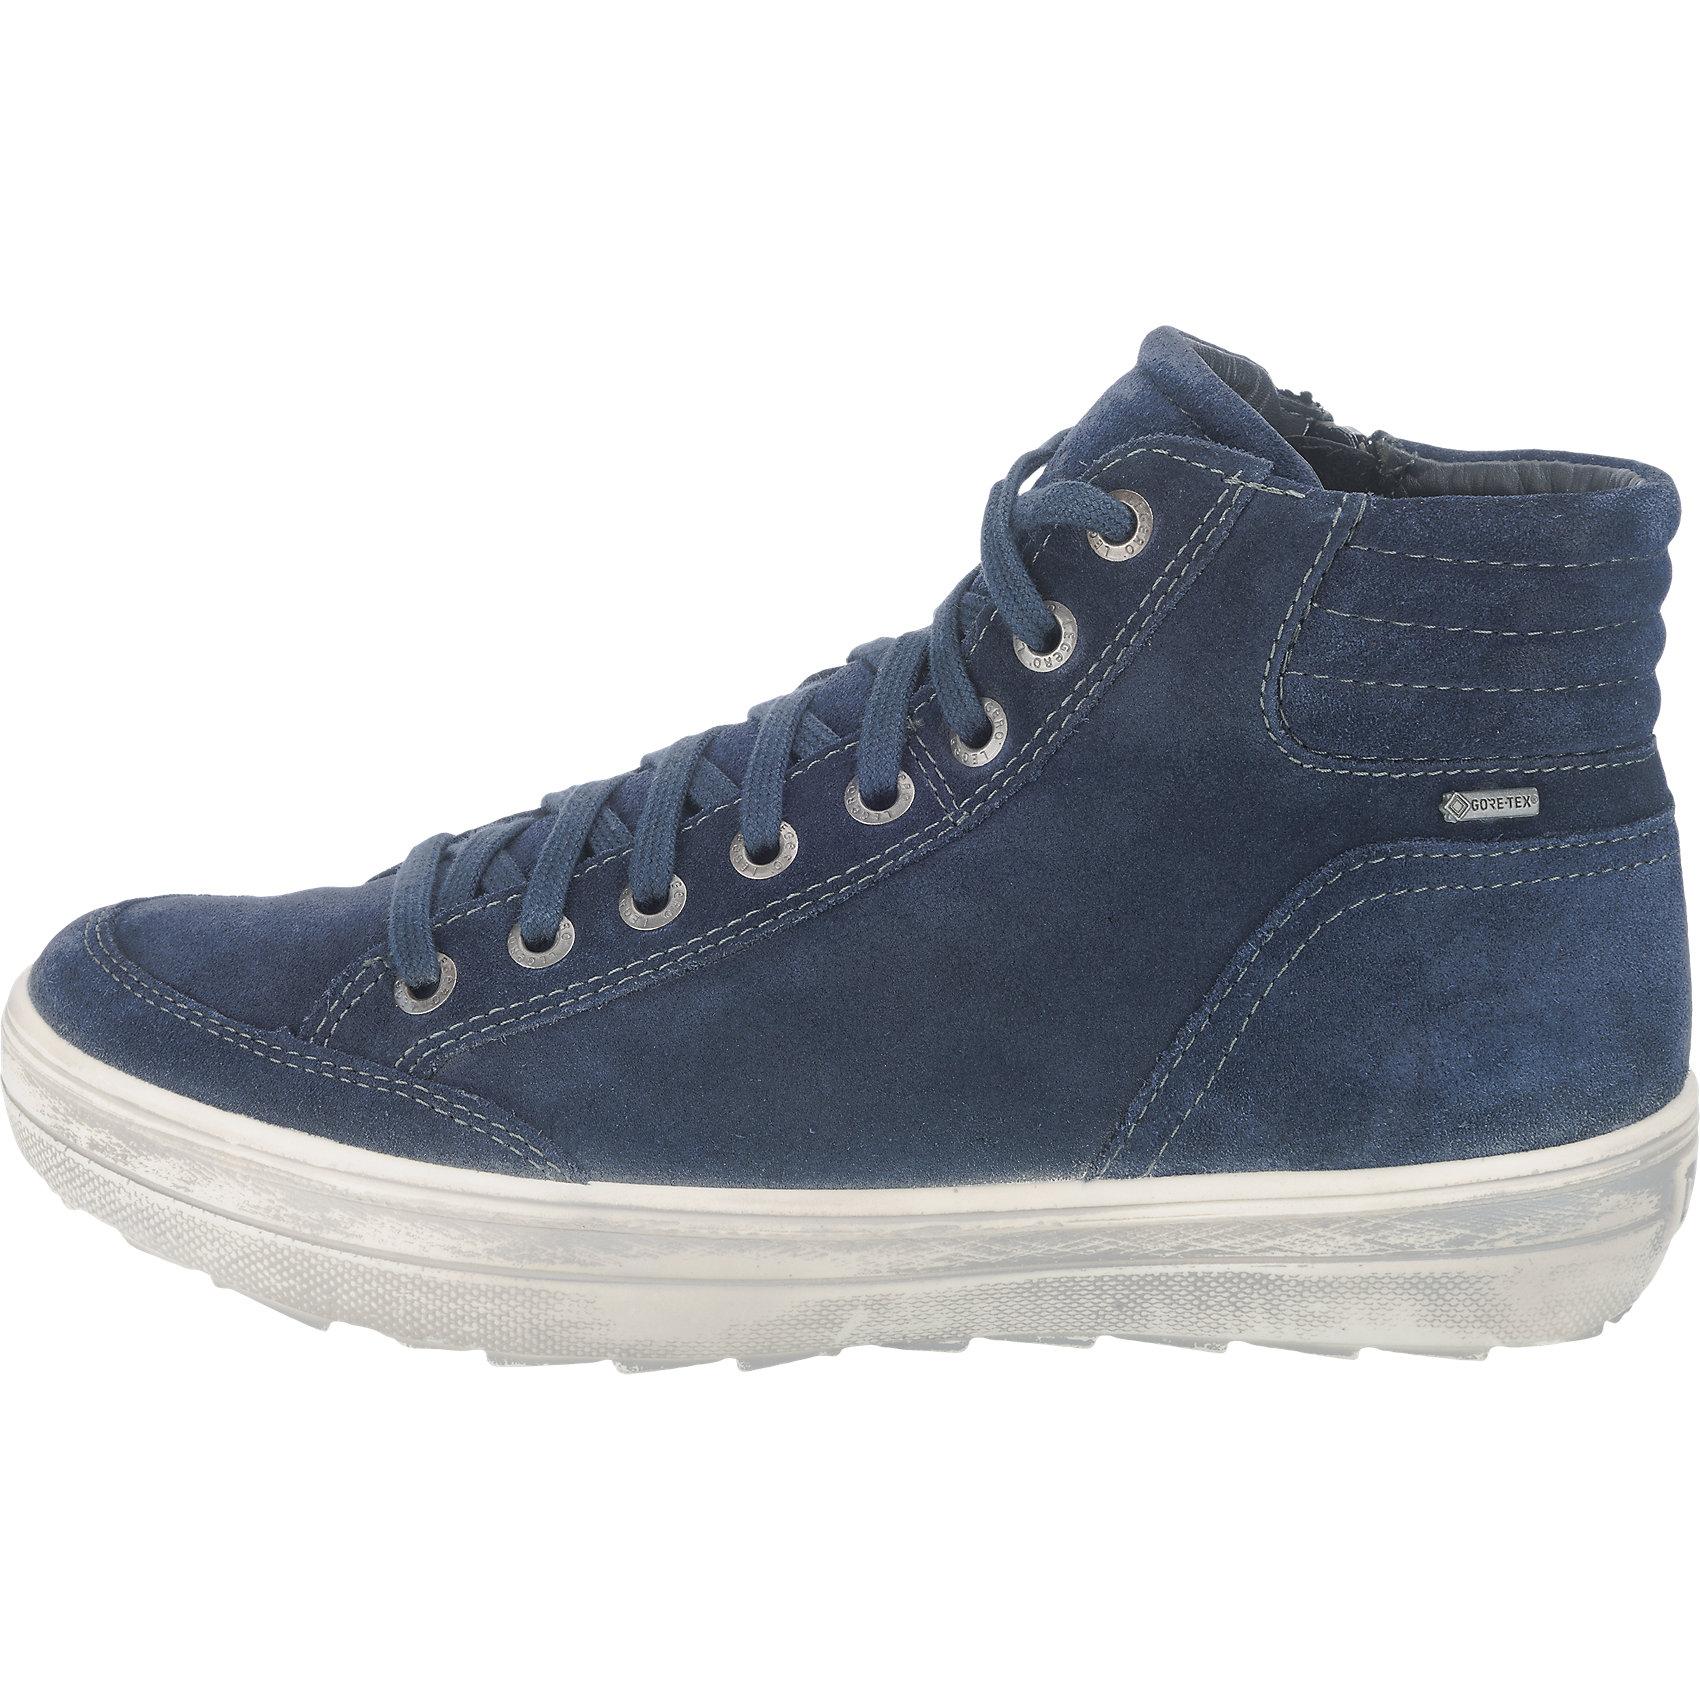 Neu-Legero-Mira-Stiefeletten-blau-grau-5758742